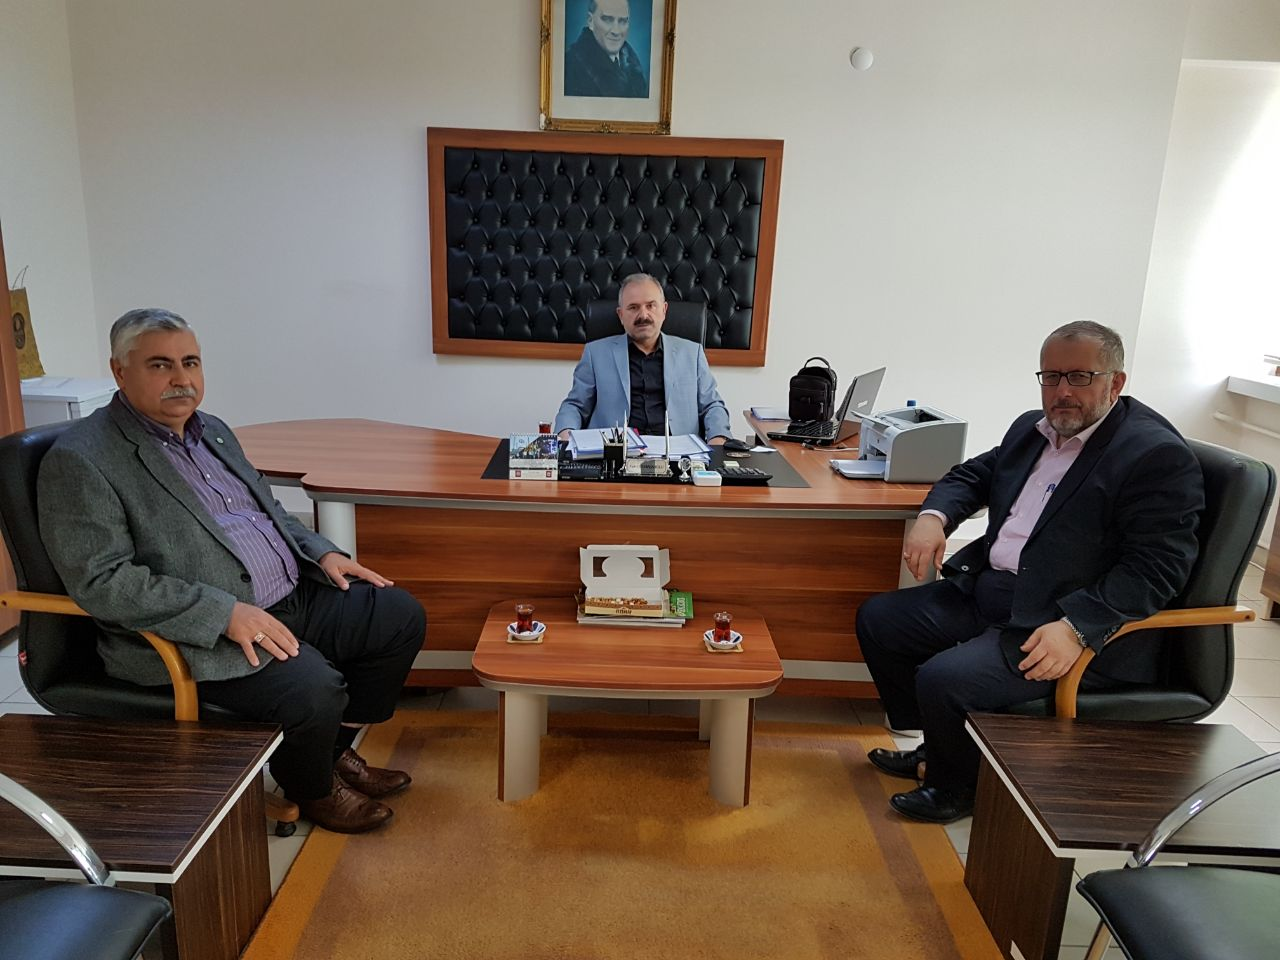 Bursa Orman Bölge Müd.Yrd.Fahri Sönmezoğlu